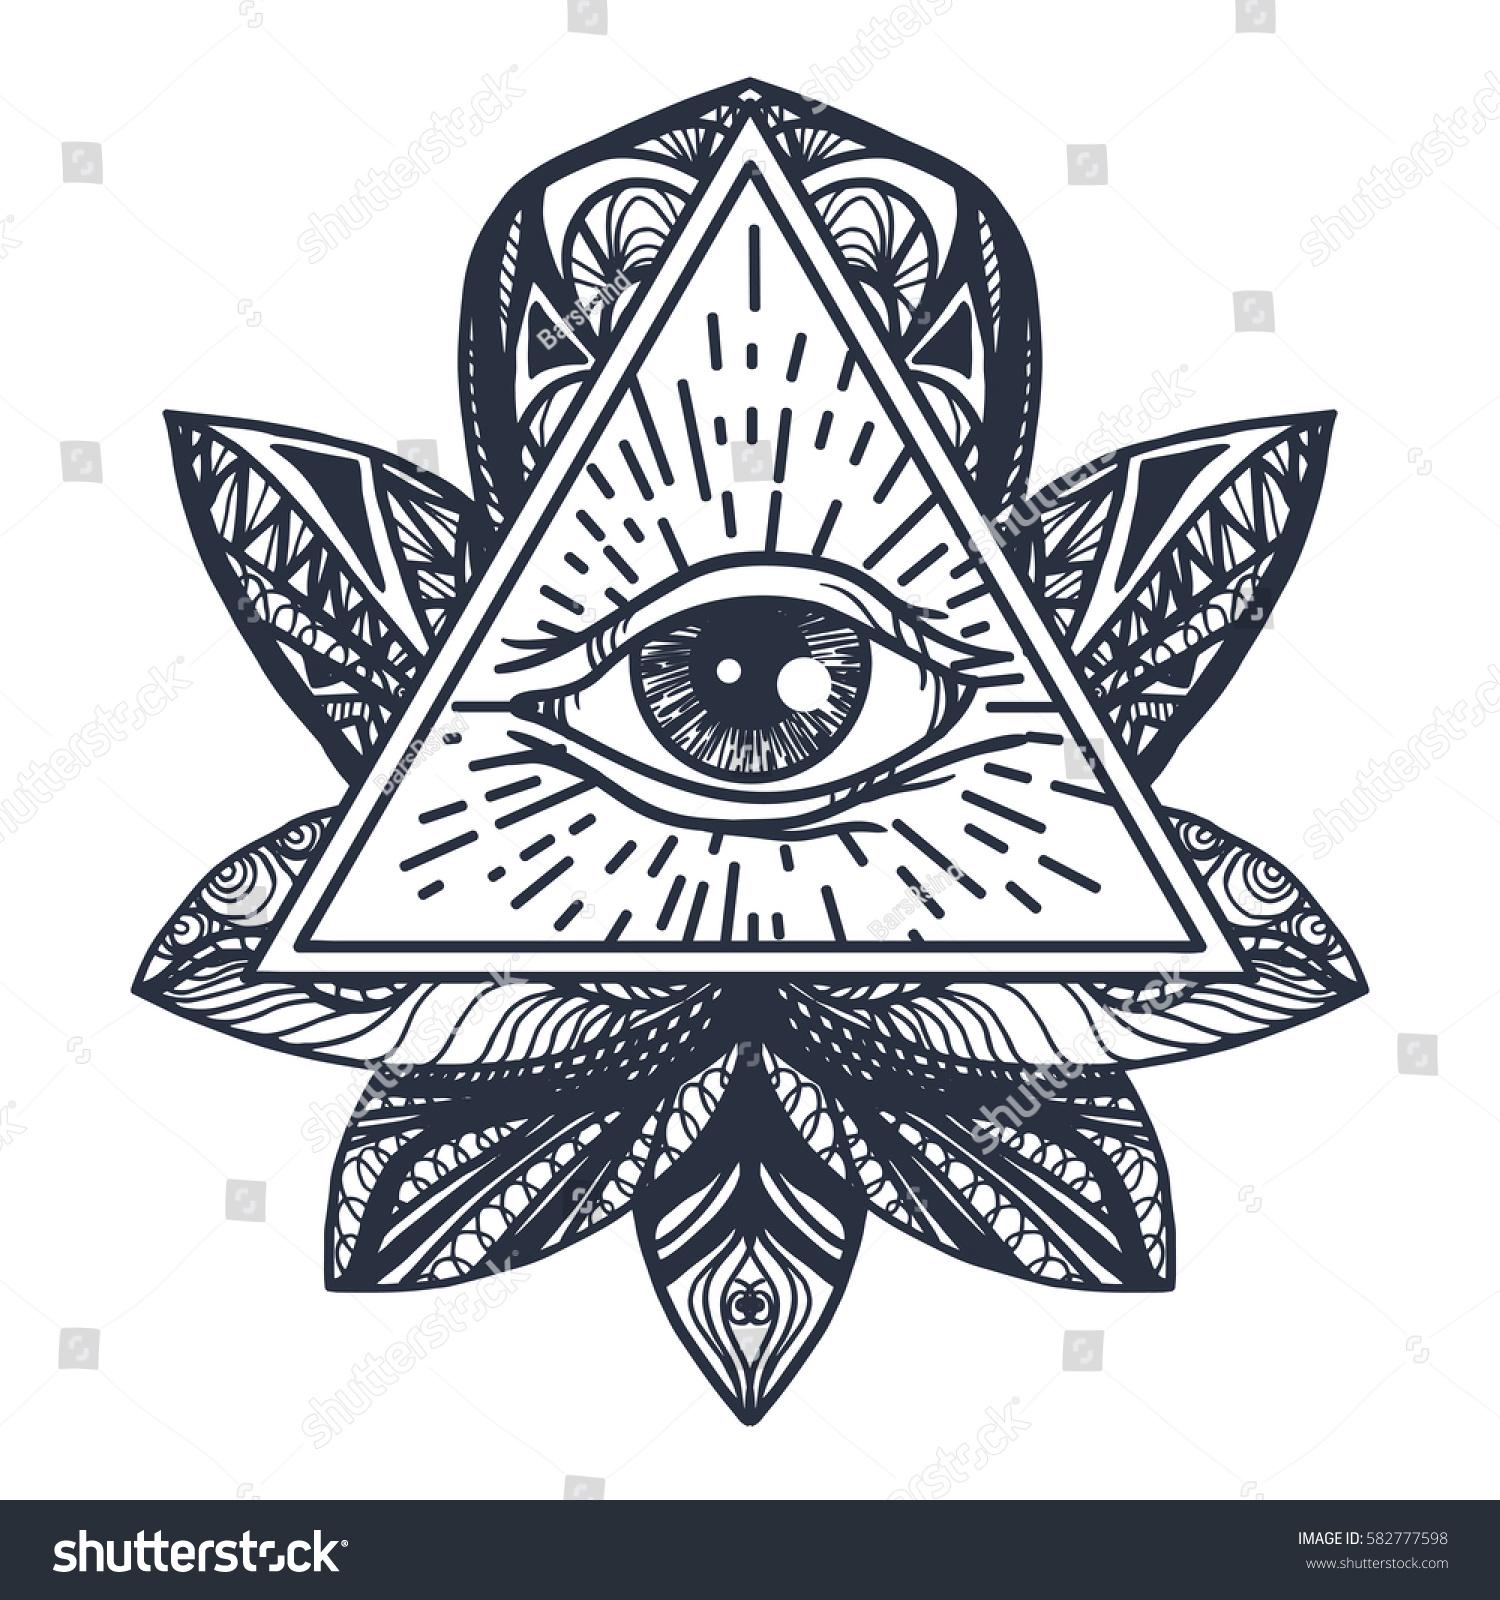 Vintage all seeing eye mandala lotus stock vector 582777598 vintage all seeing eye in mandala lotus providence magic symbol for print tattoo buycottarizona